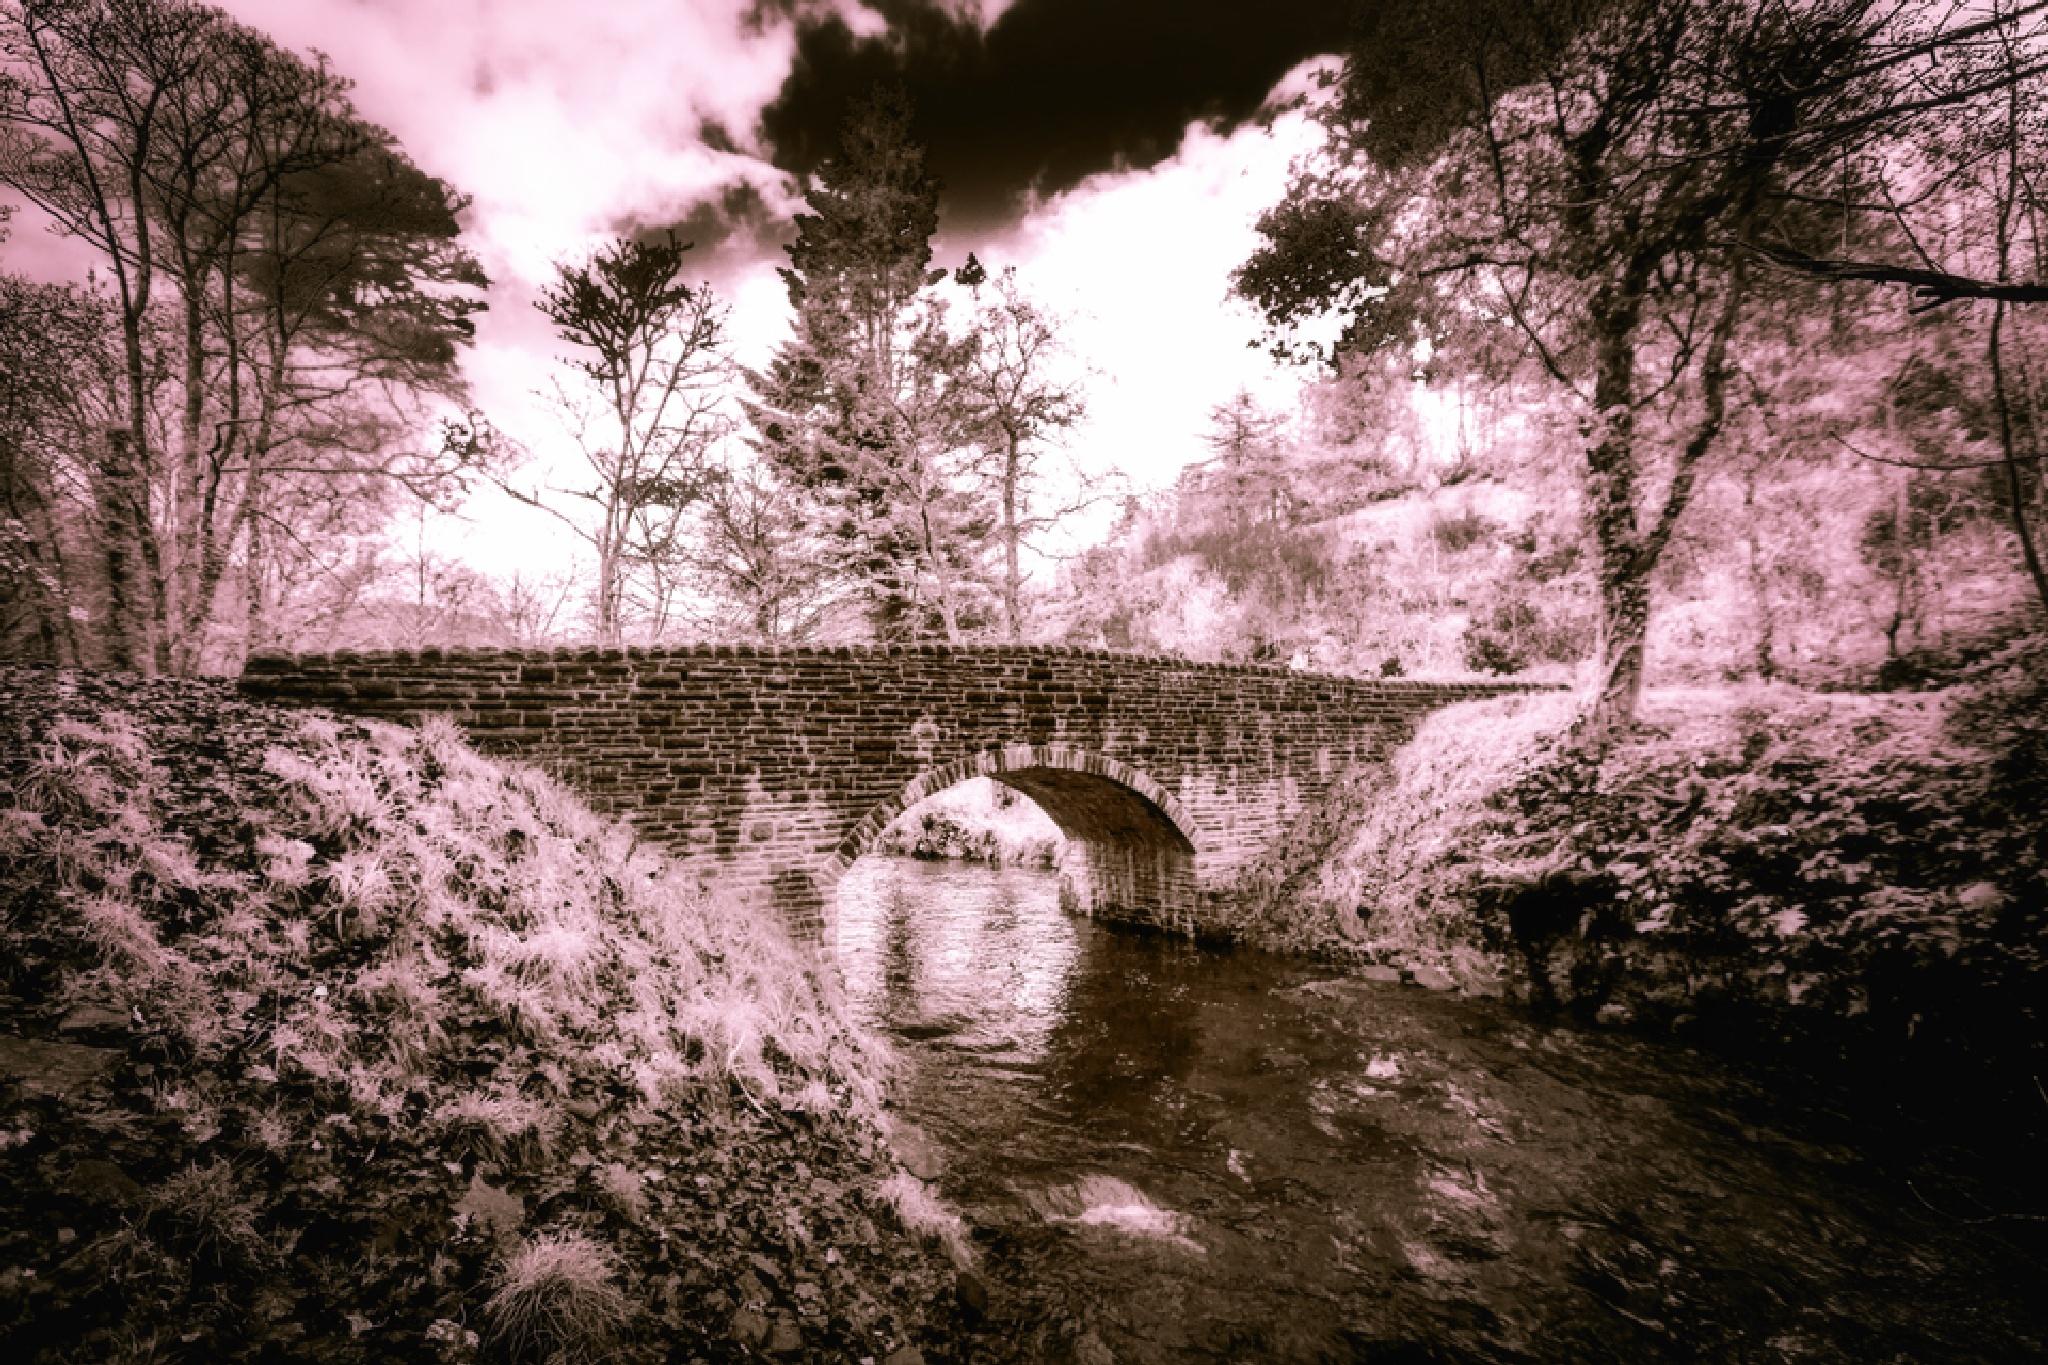 Bridge over stream by Gary Martin